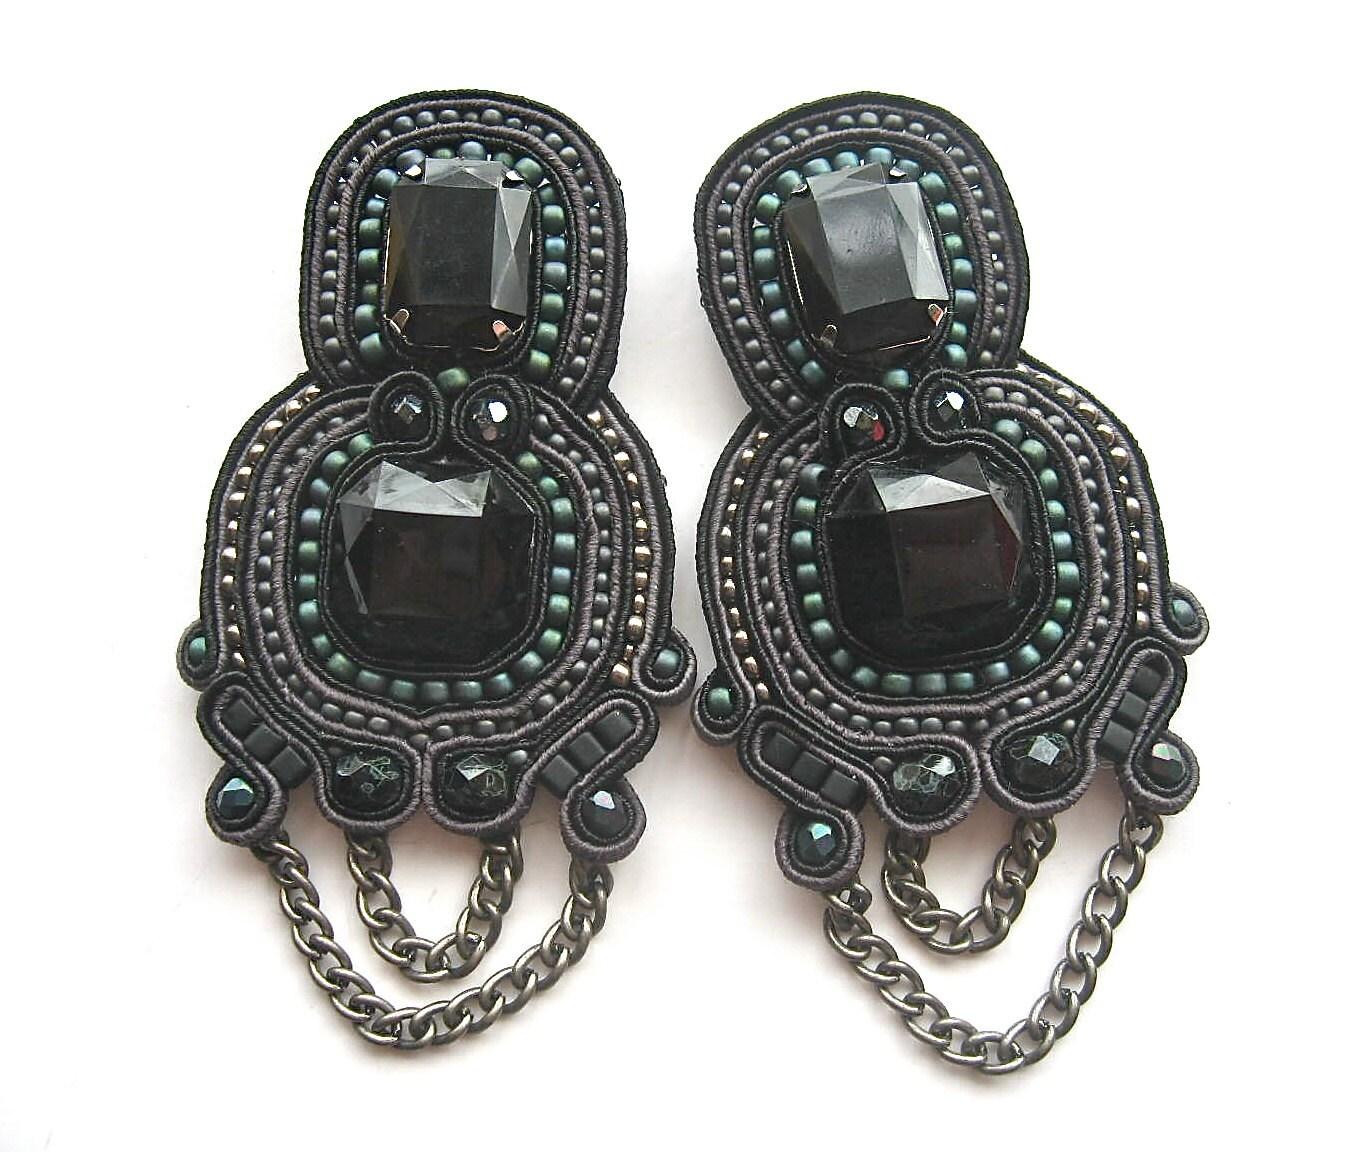 DARK KNIGHT  soutache earrings in black, gunmetal and iris teal - BlackMarketJewels